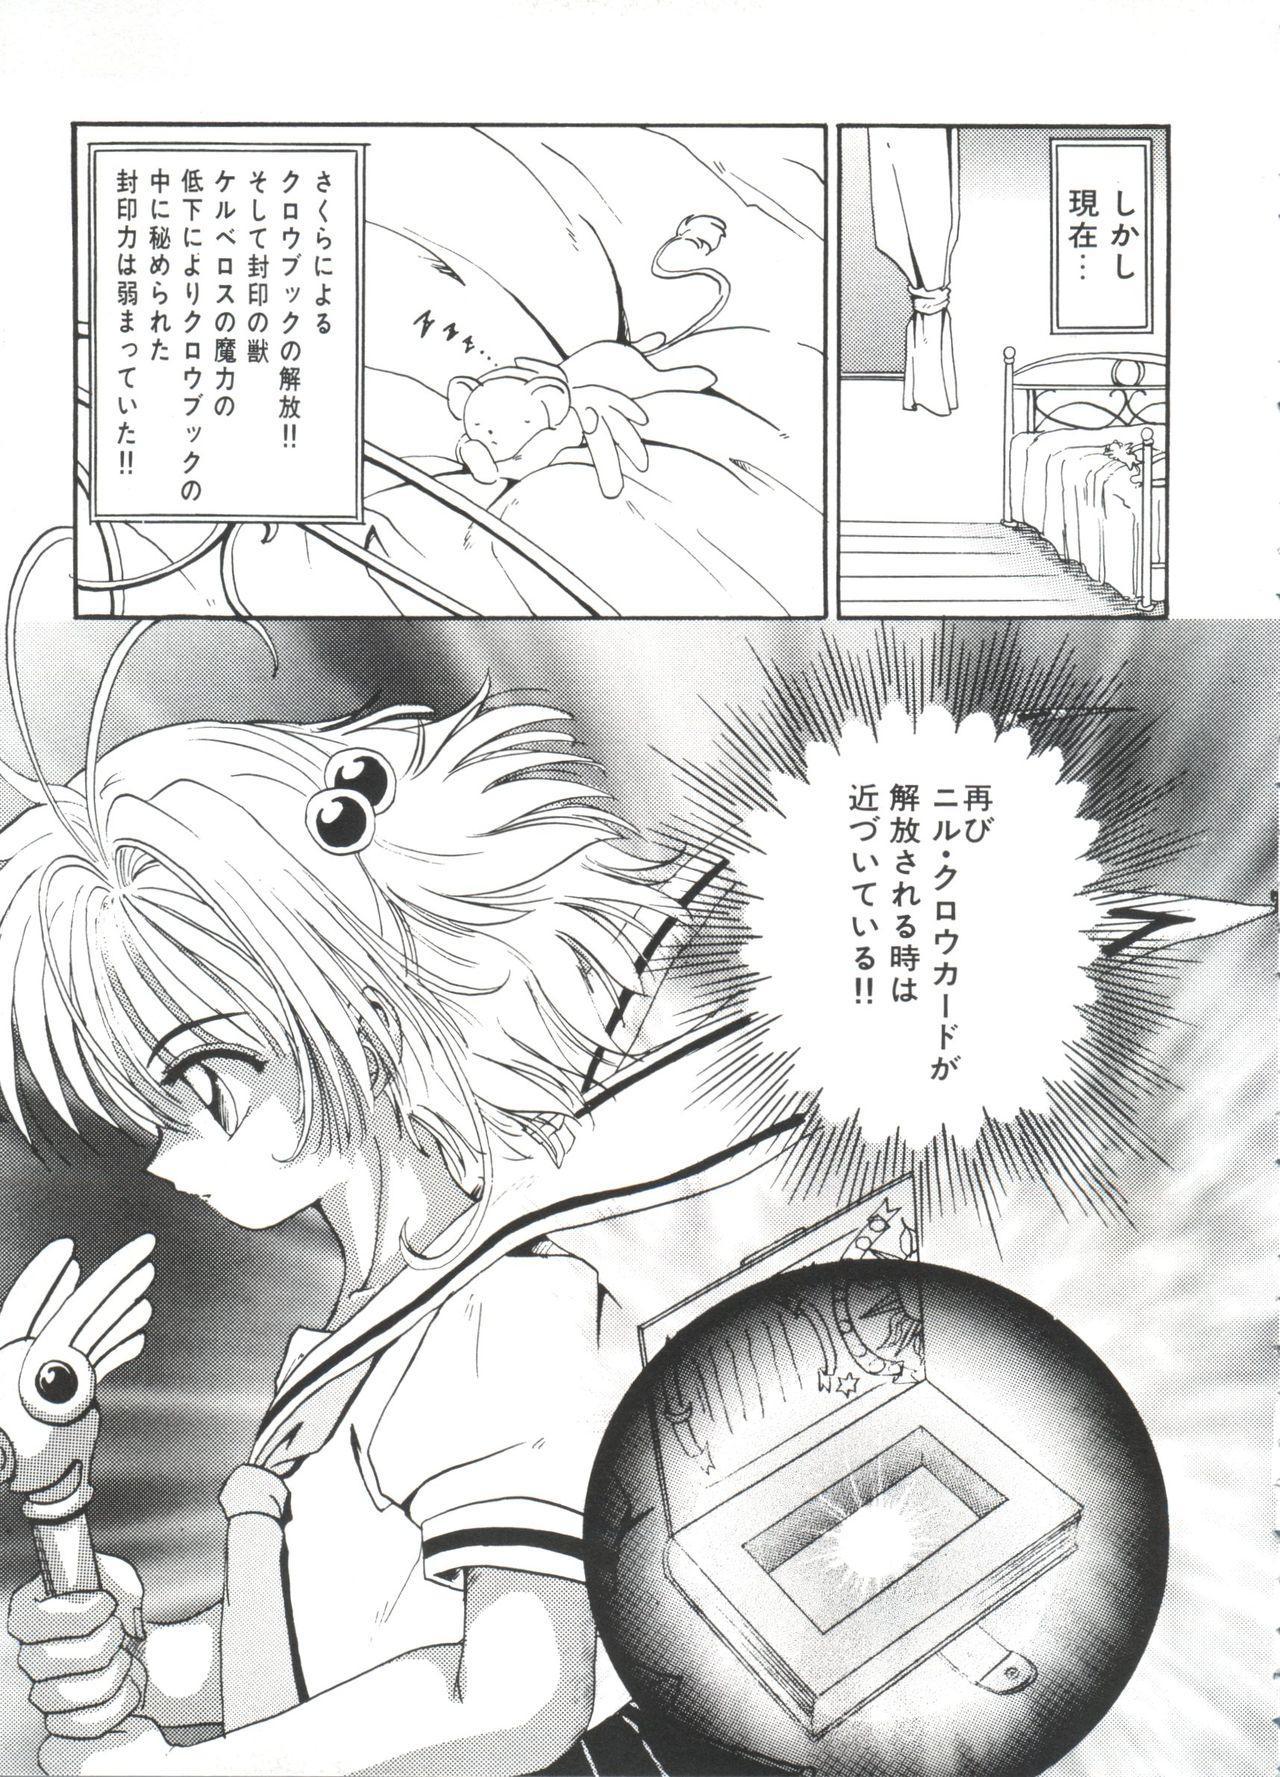 Ero-chan to Issho 2 94